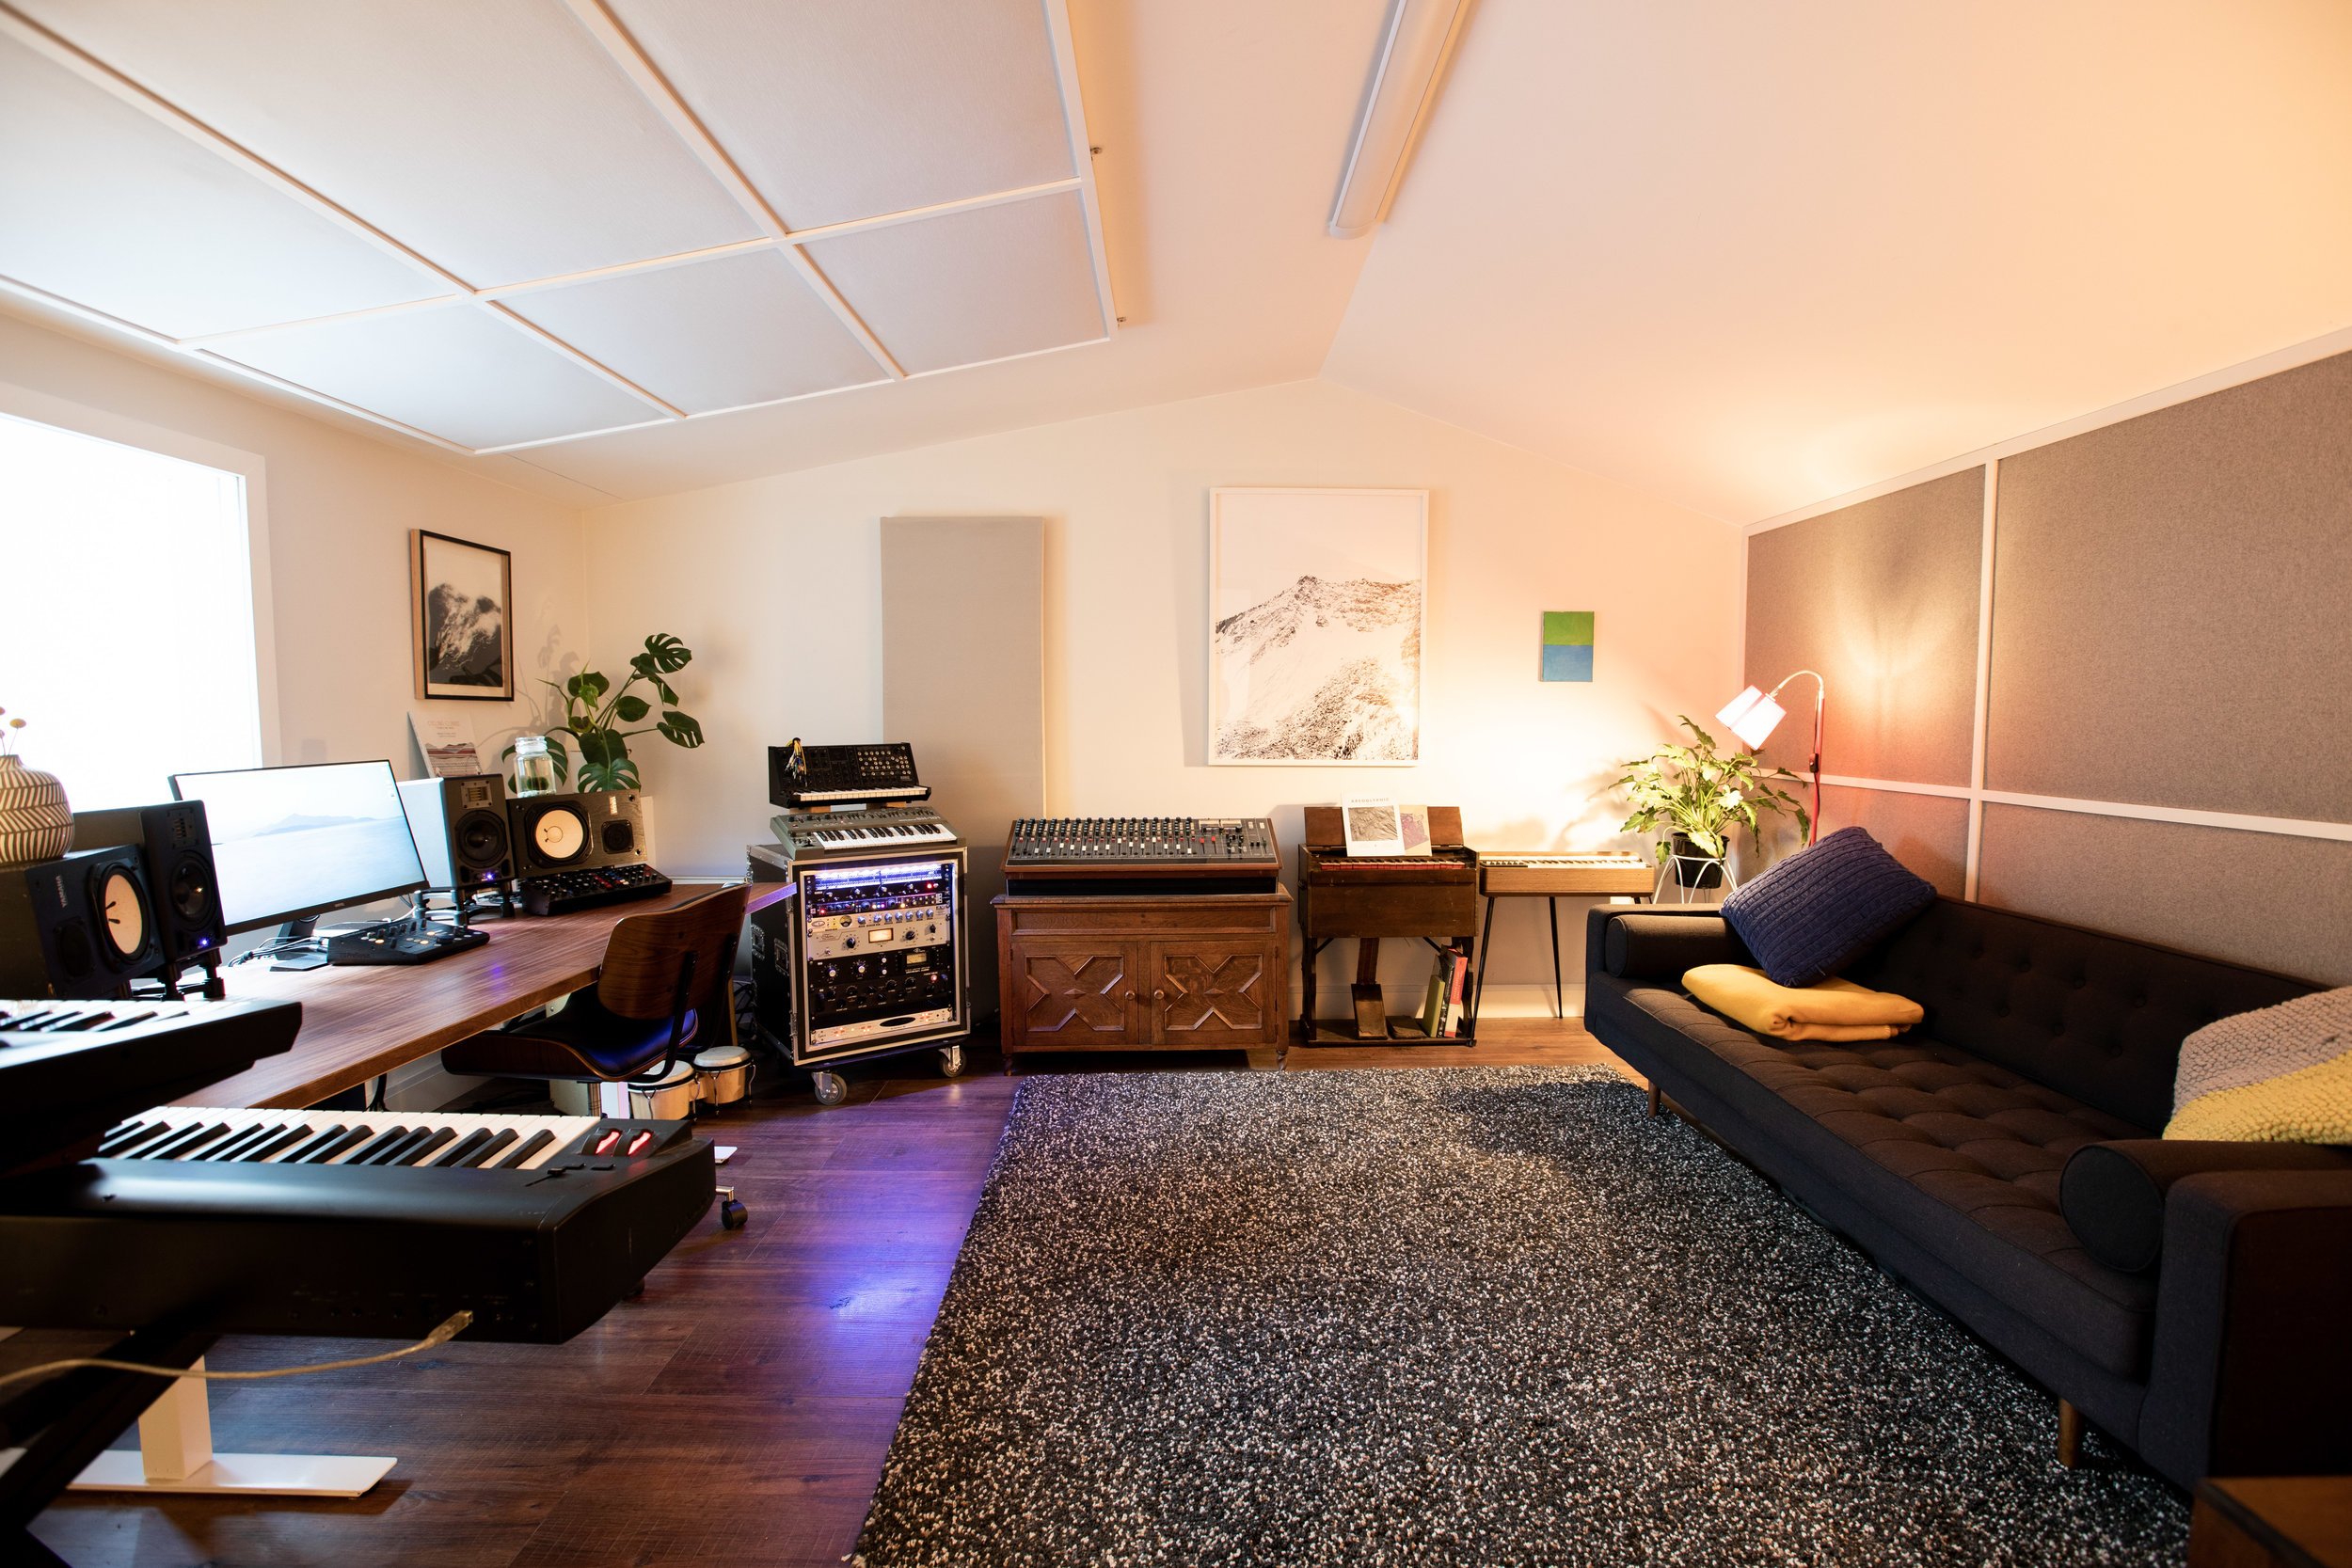 Fall Back Studios Studio 1 Image 1